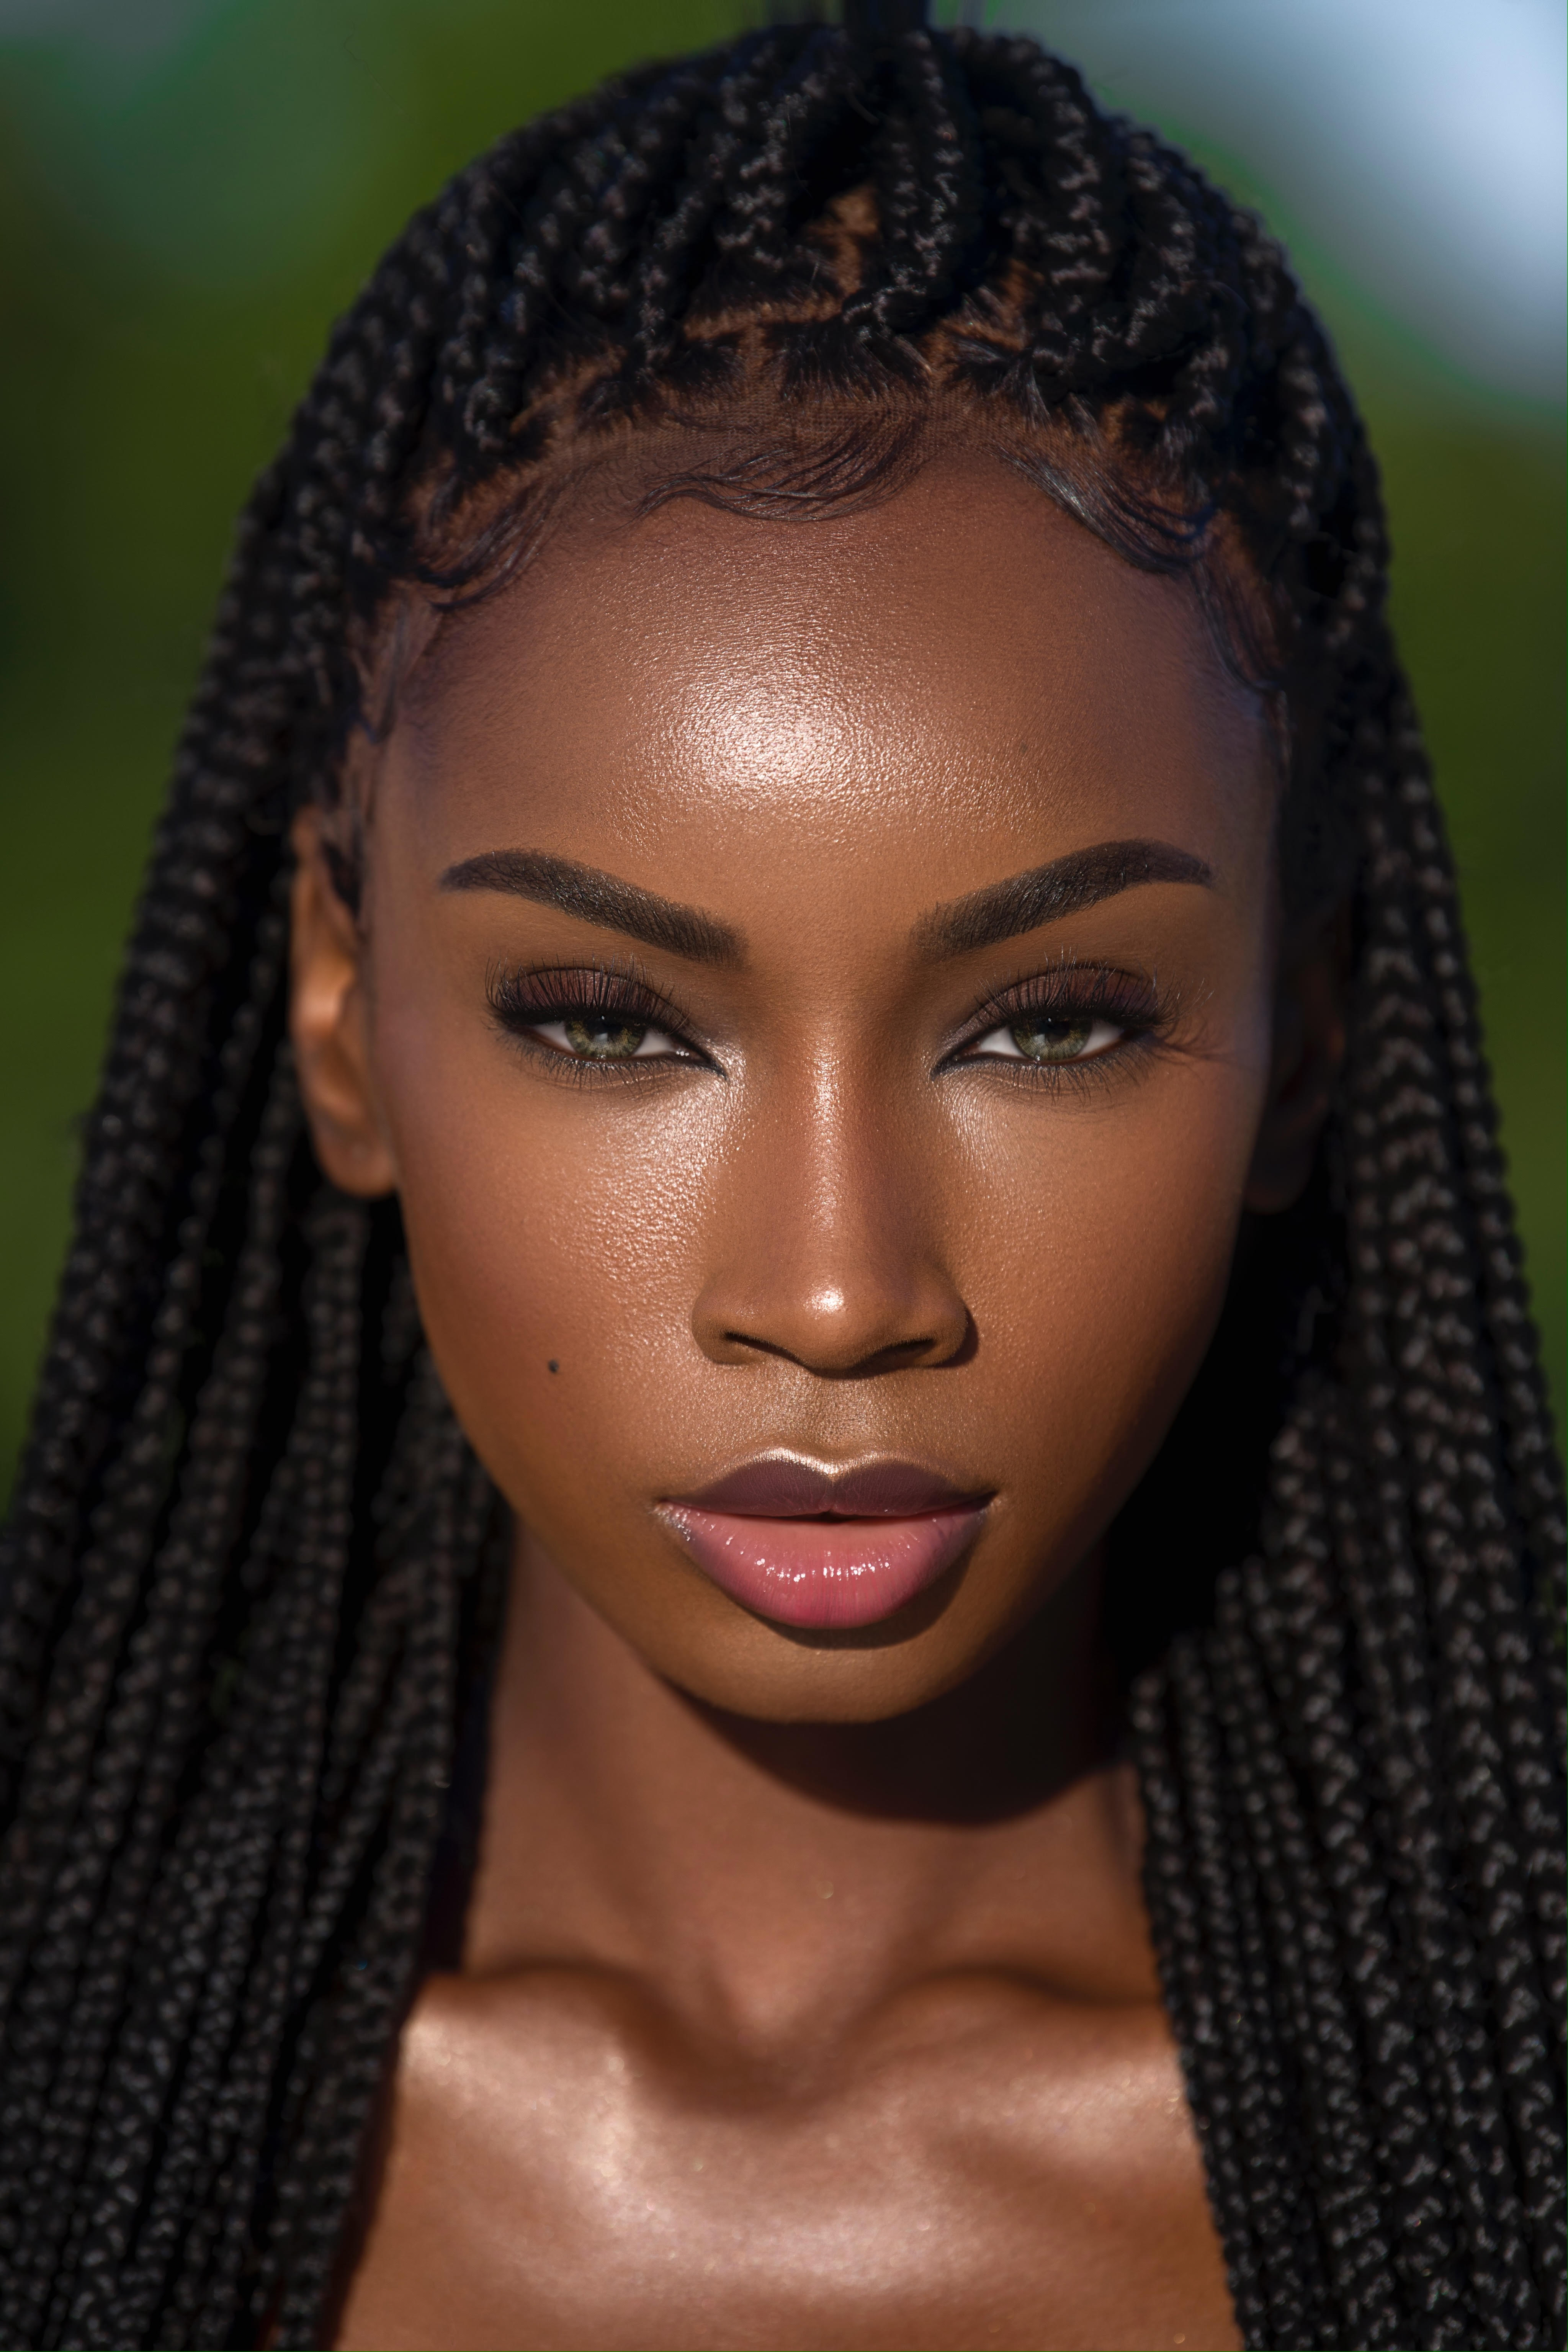 Aissata Diallo